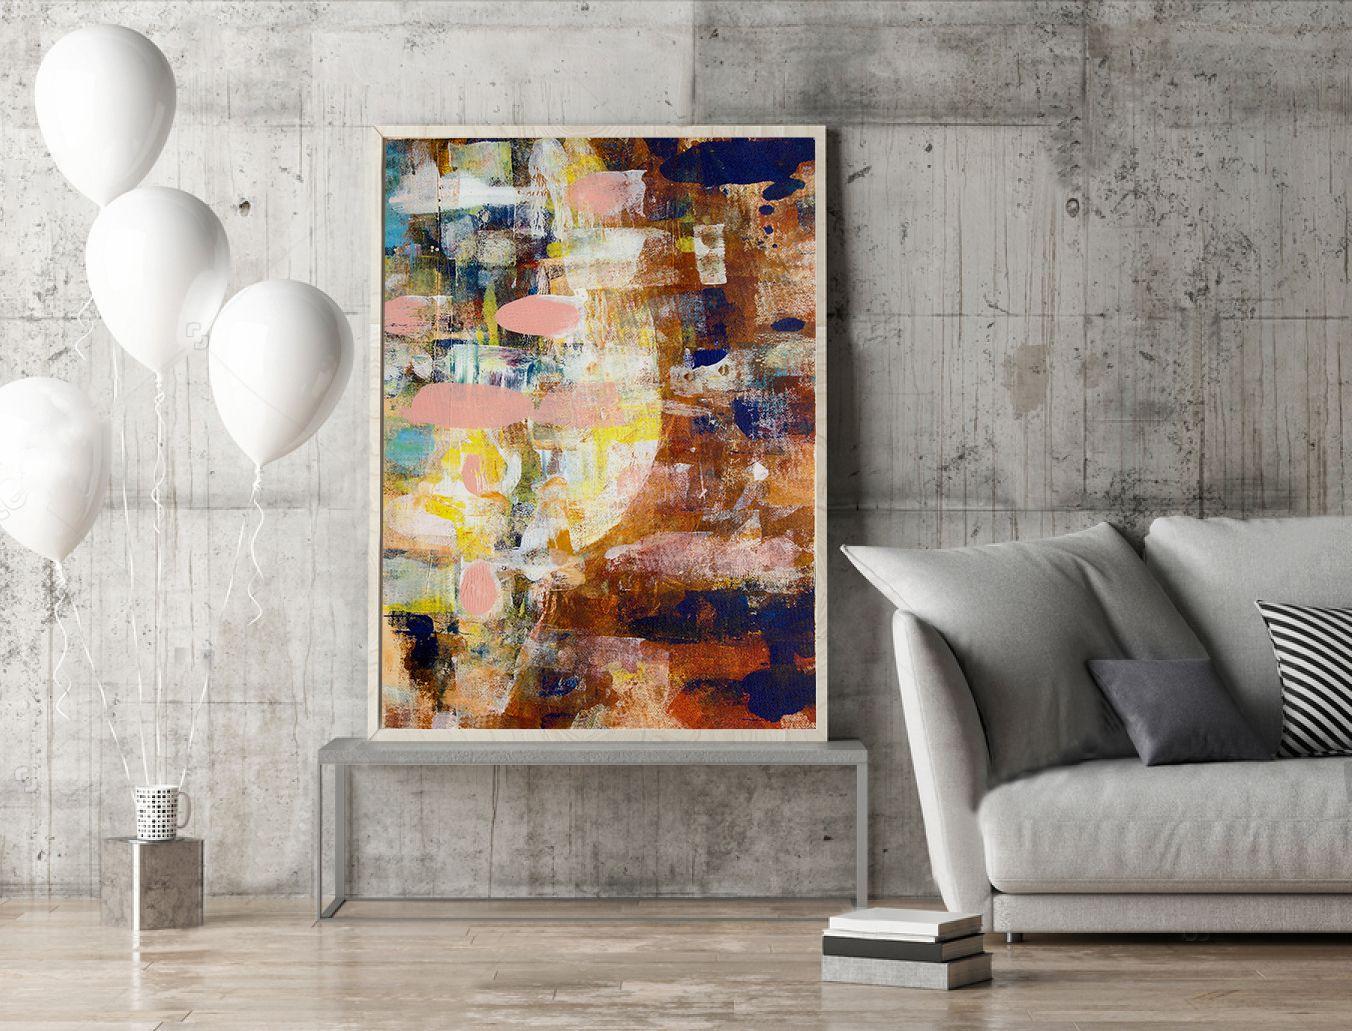 Living room abstract living room abstract art living room abstract